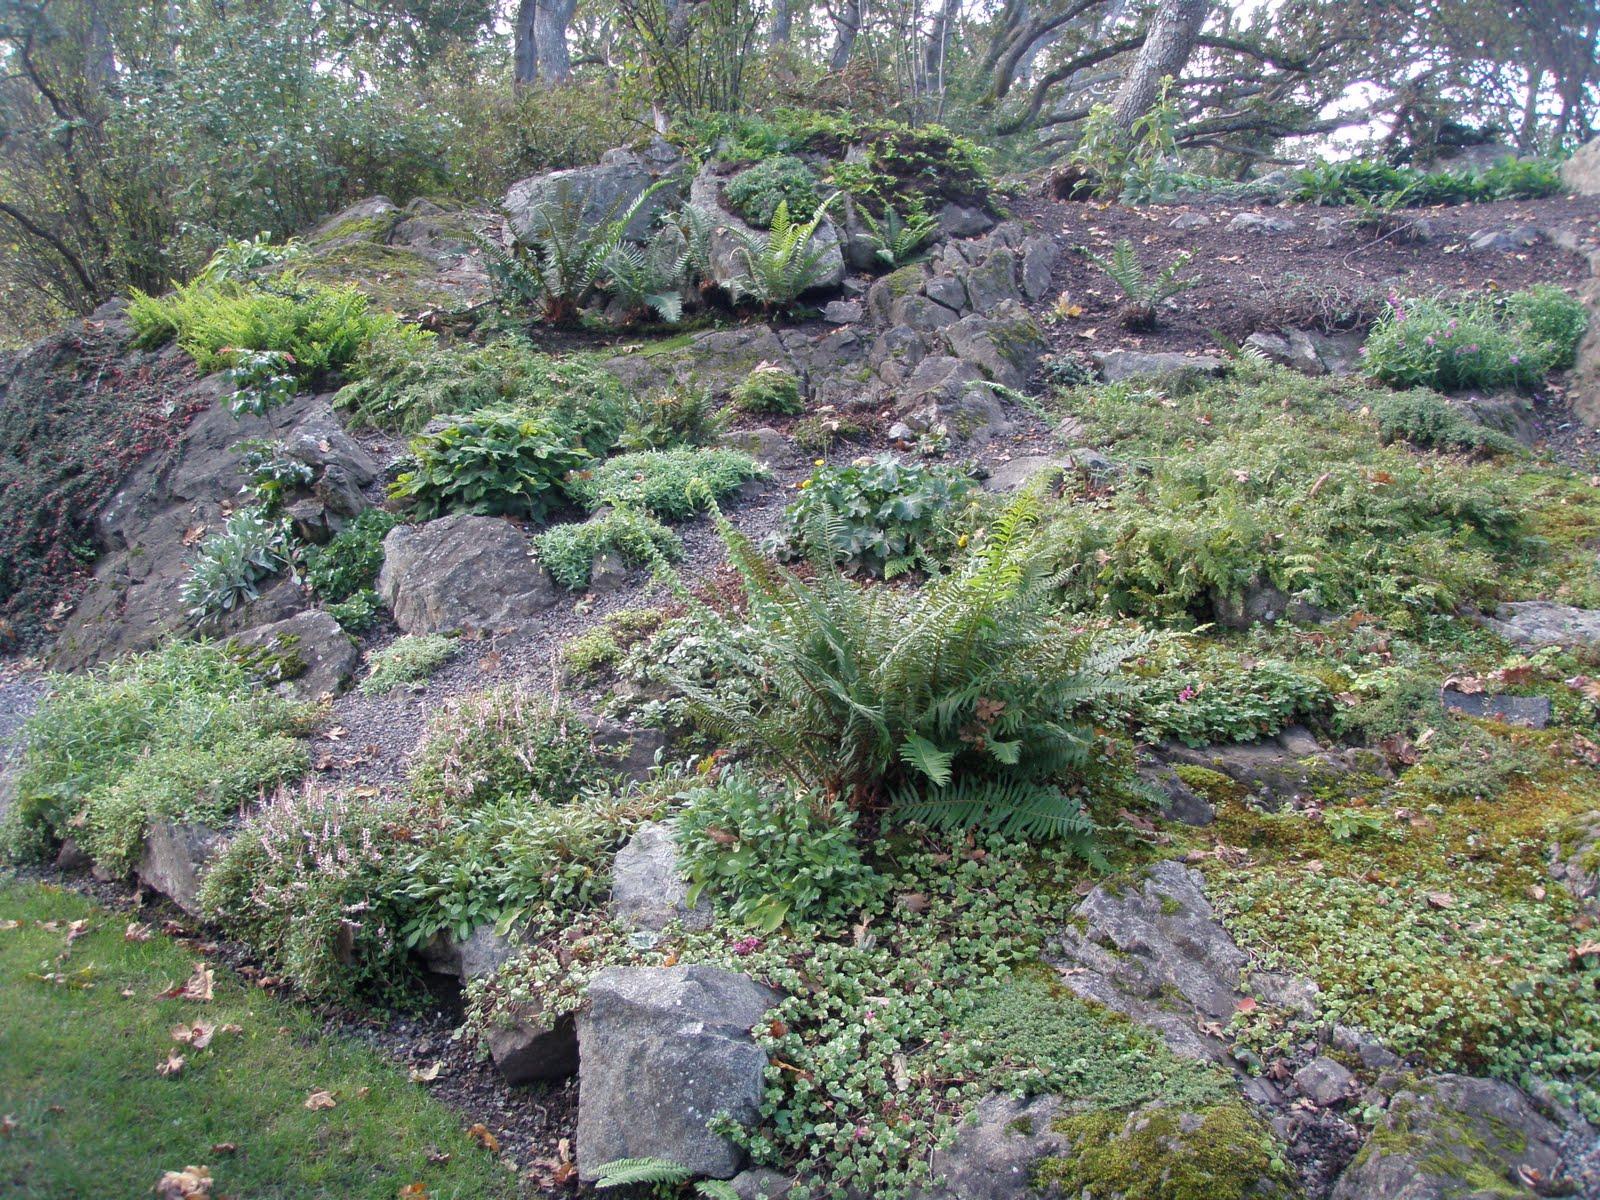 Revisiting British Columbian Rock Gardens